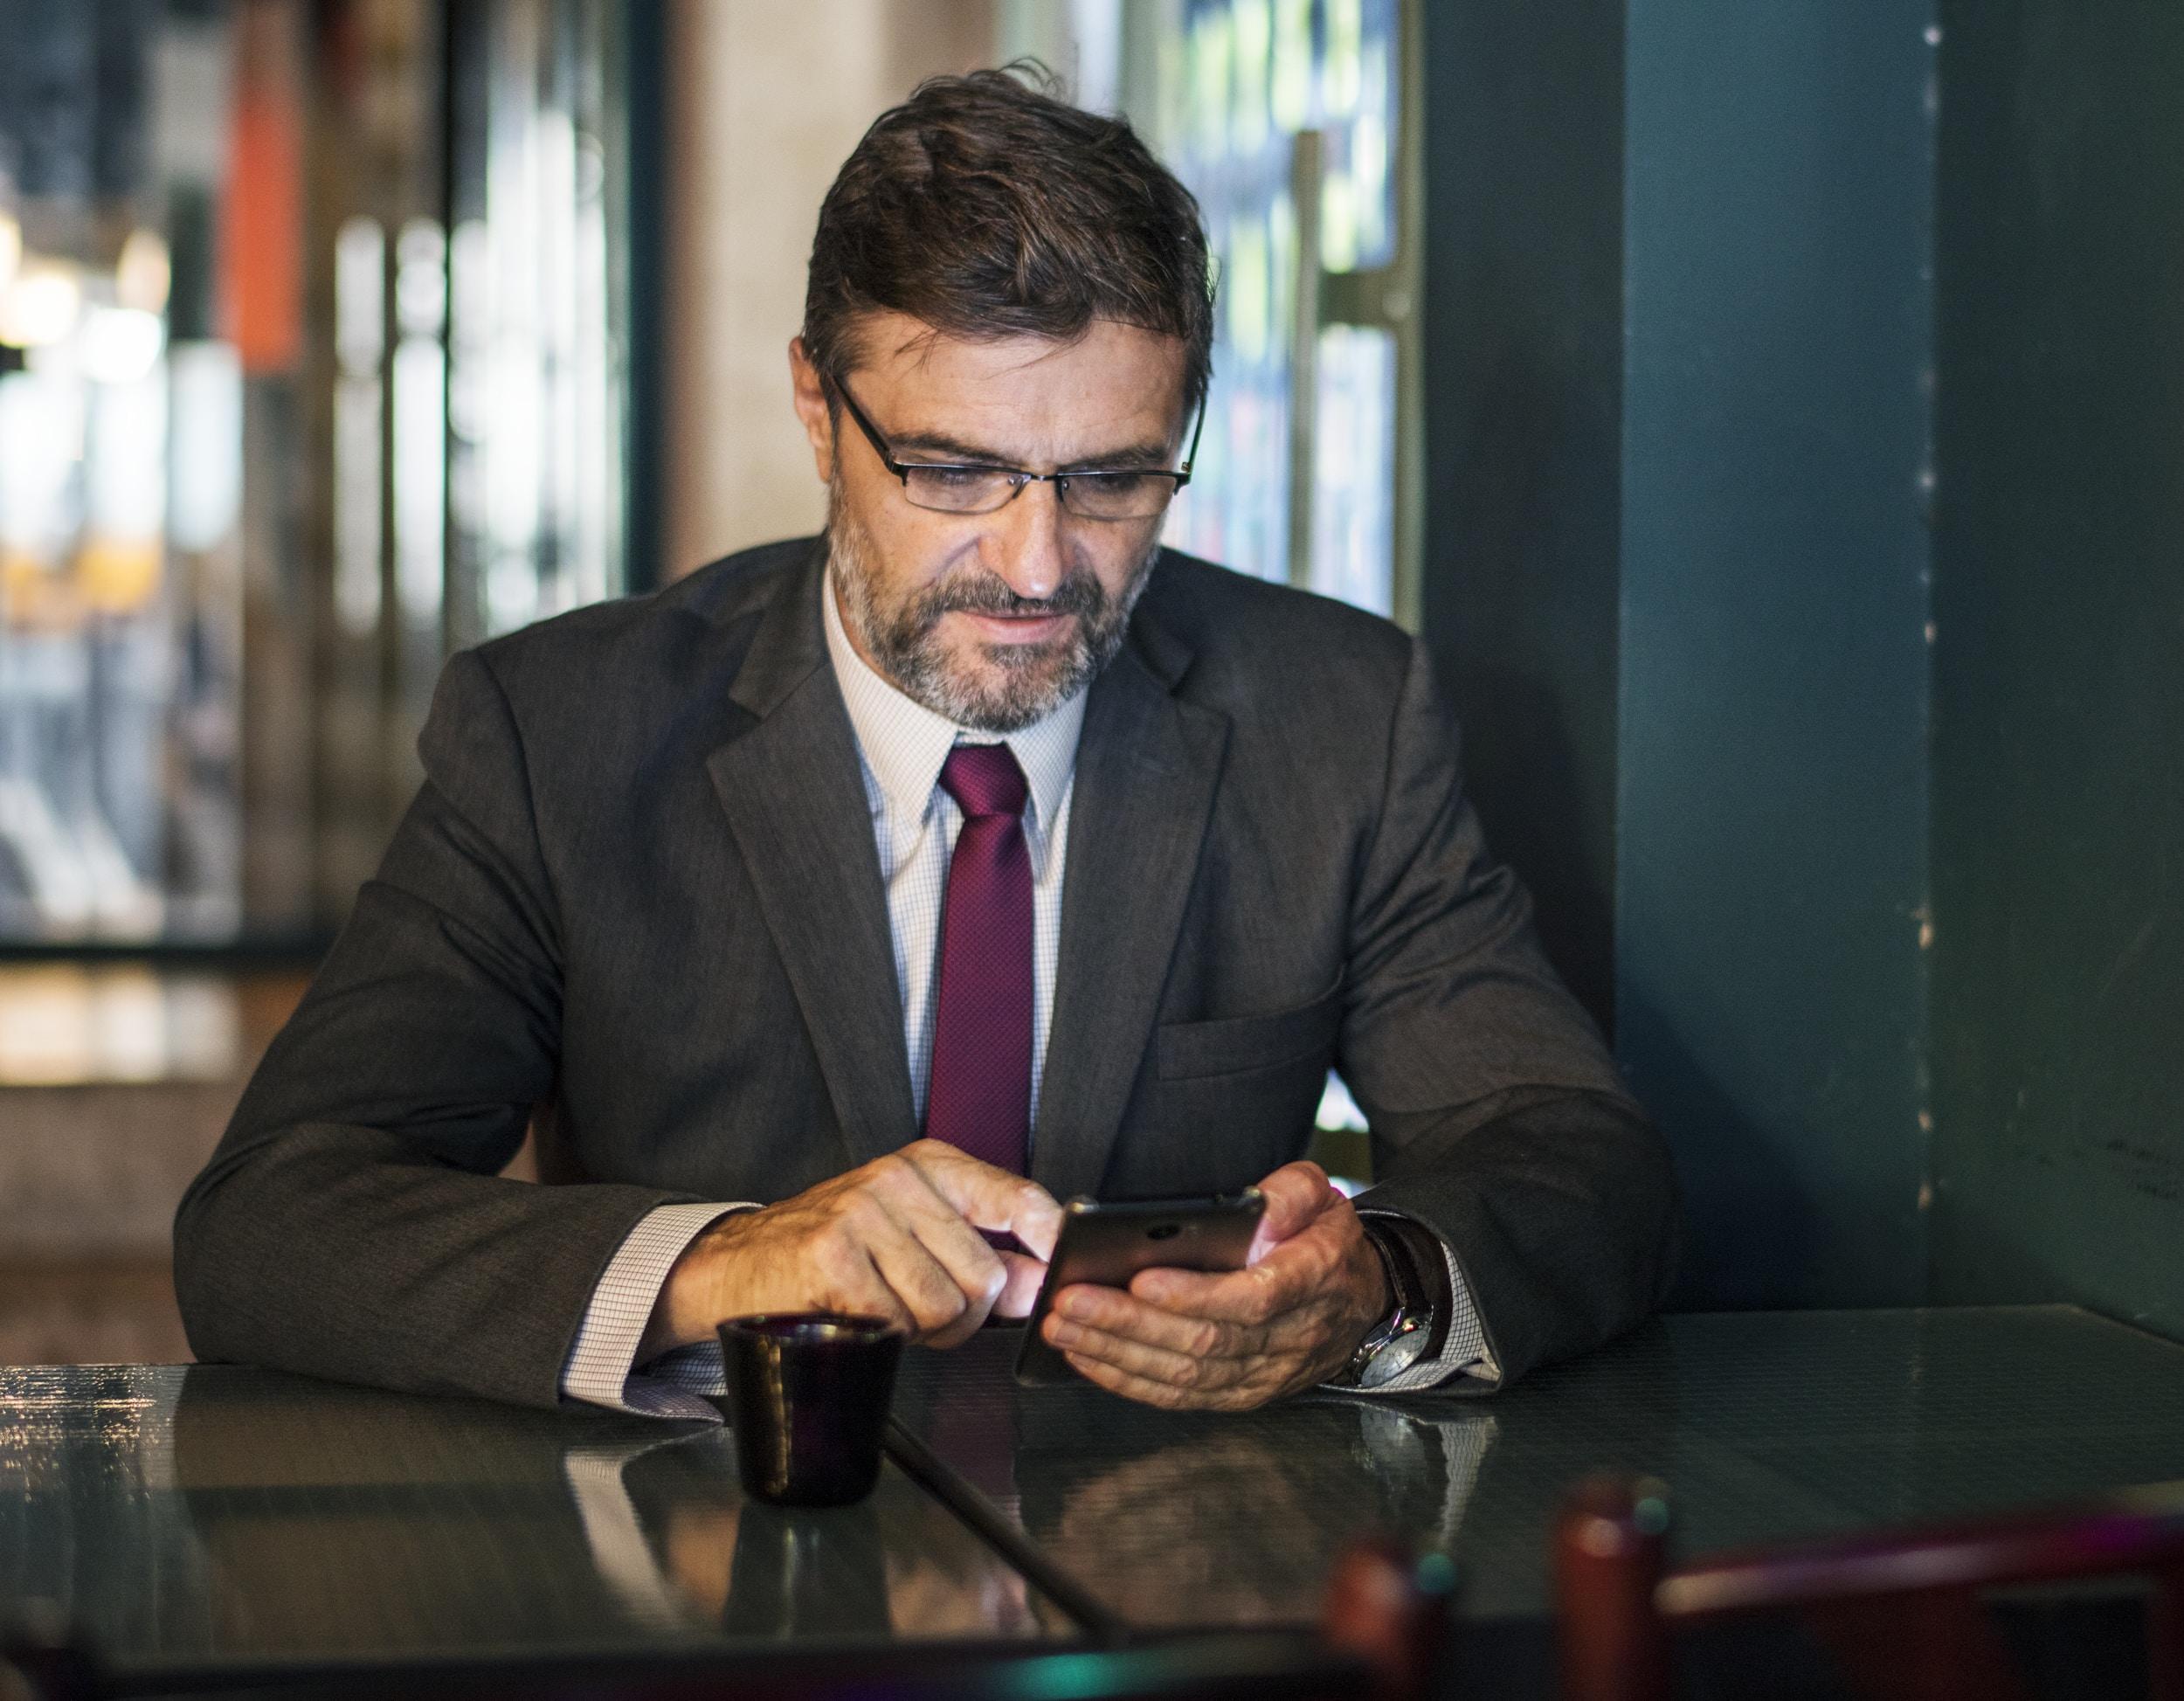 man sitting using smartphone